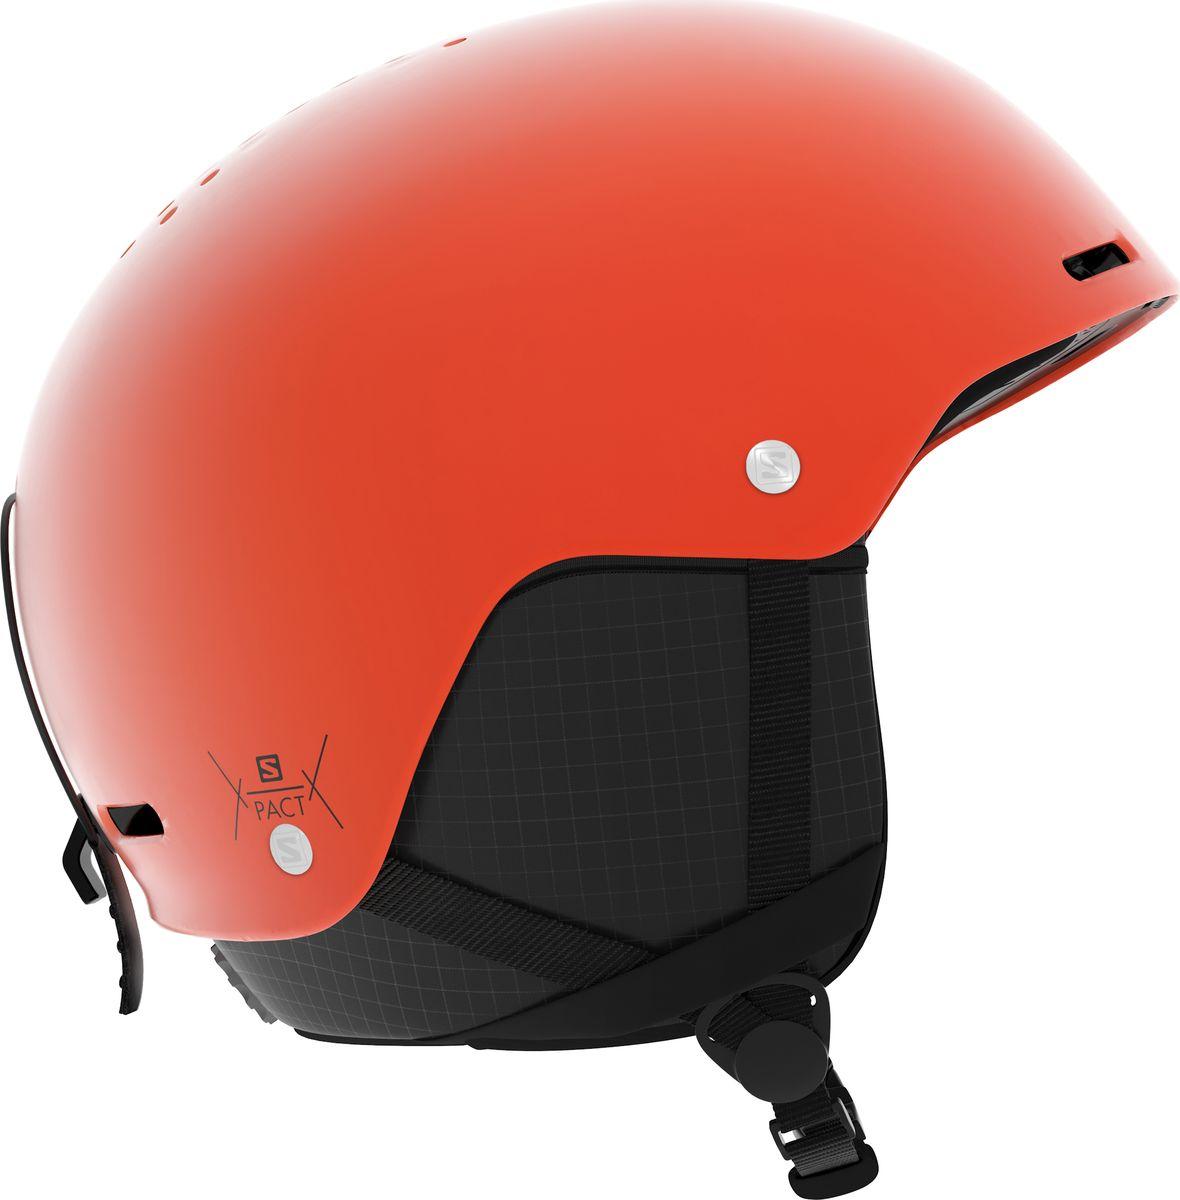 Шлем горнолыжный Salomon Pact, цвет: оранжевый. Размер M (56-59)